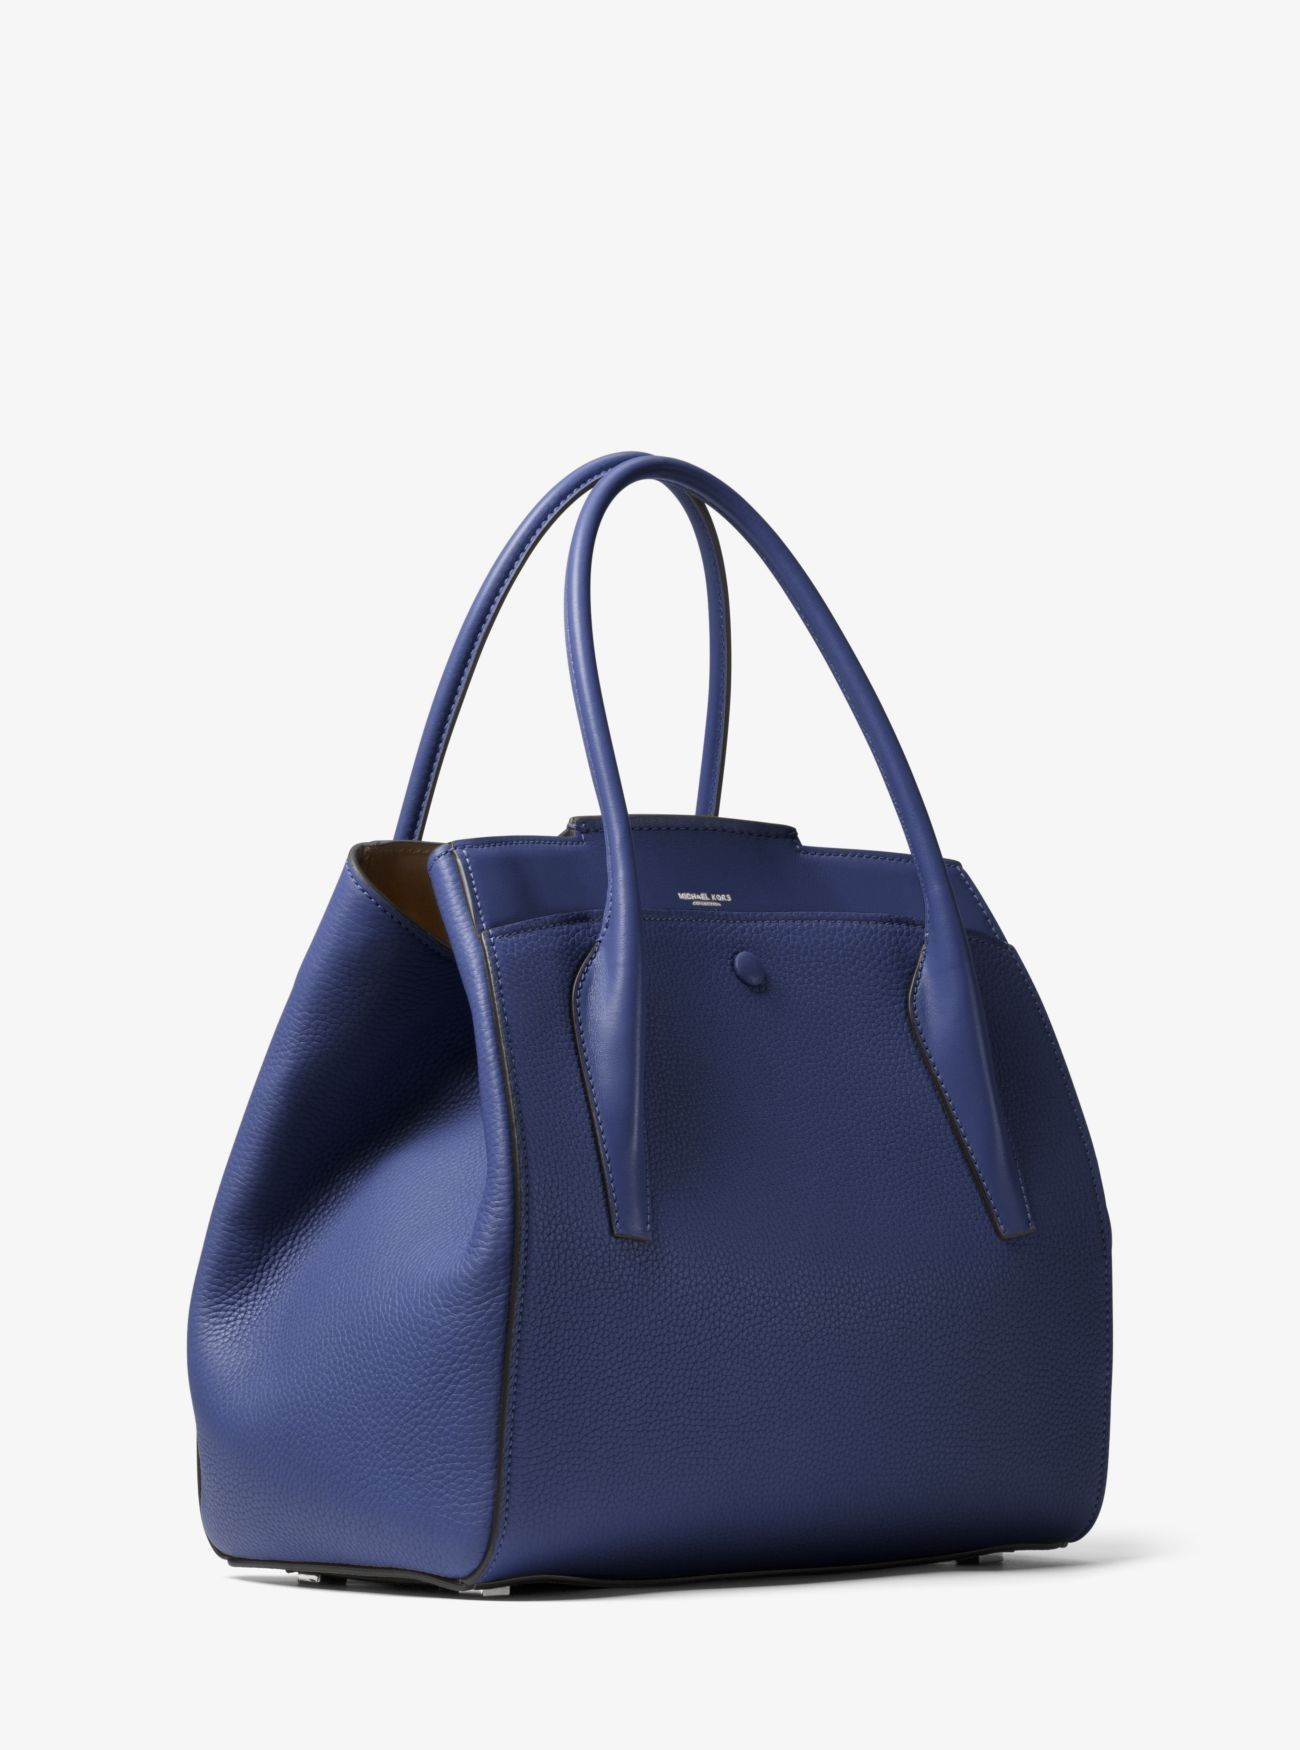 f24ddc7e51c7 Price Michael Kors Sapphire Bancroft Large Calf Leather Satchel Online Store